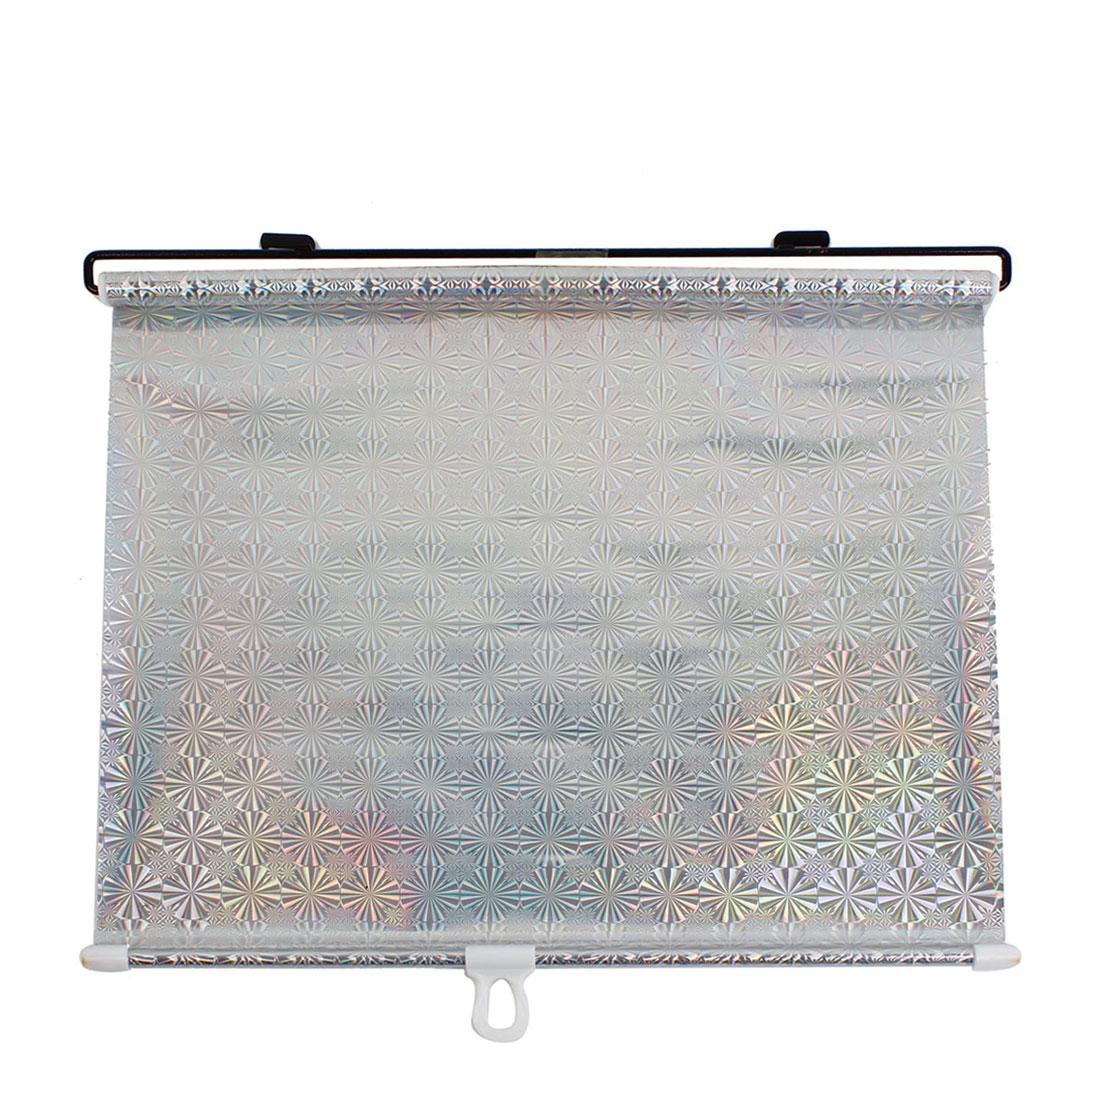 Car Vehicle Silver Tone Retractable Window Screen Sun Shade Guard 134cm x 42cm